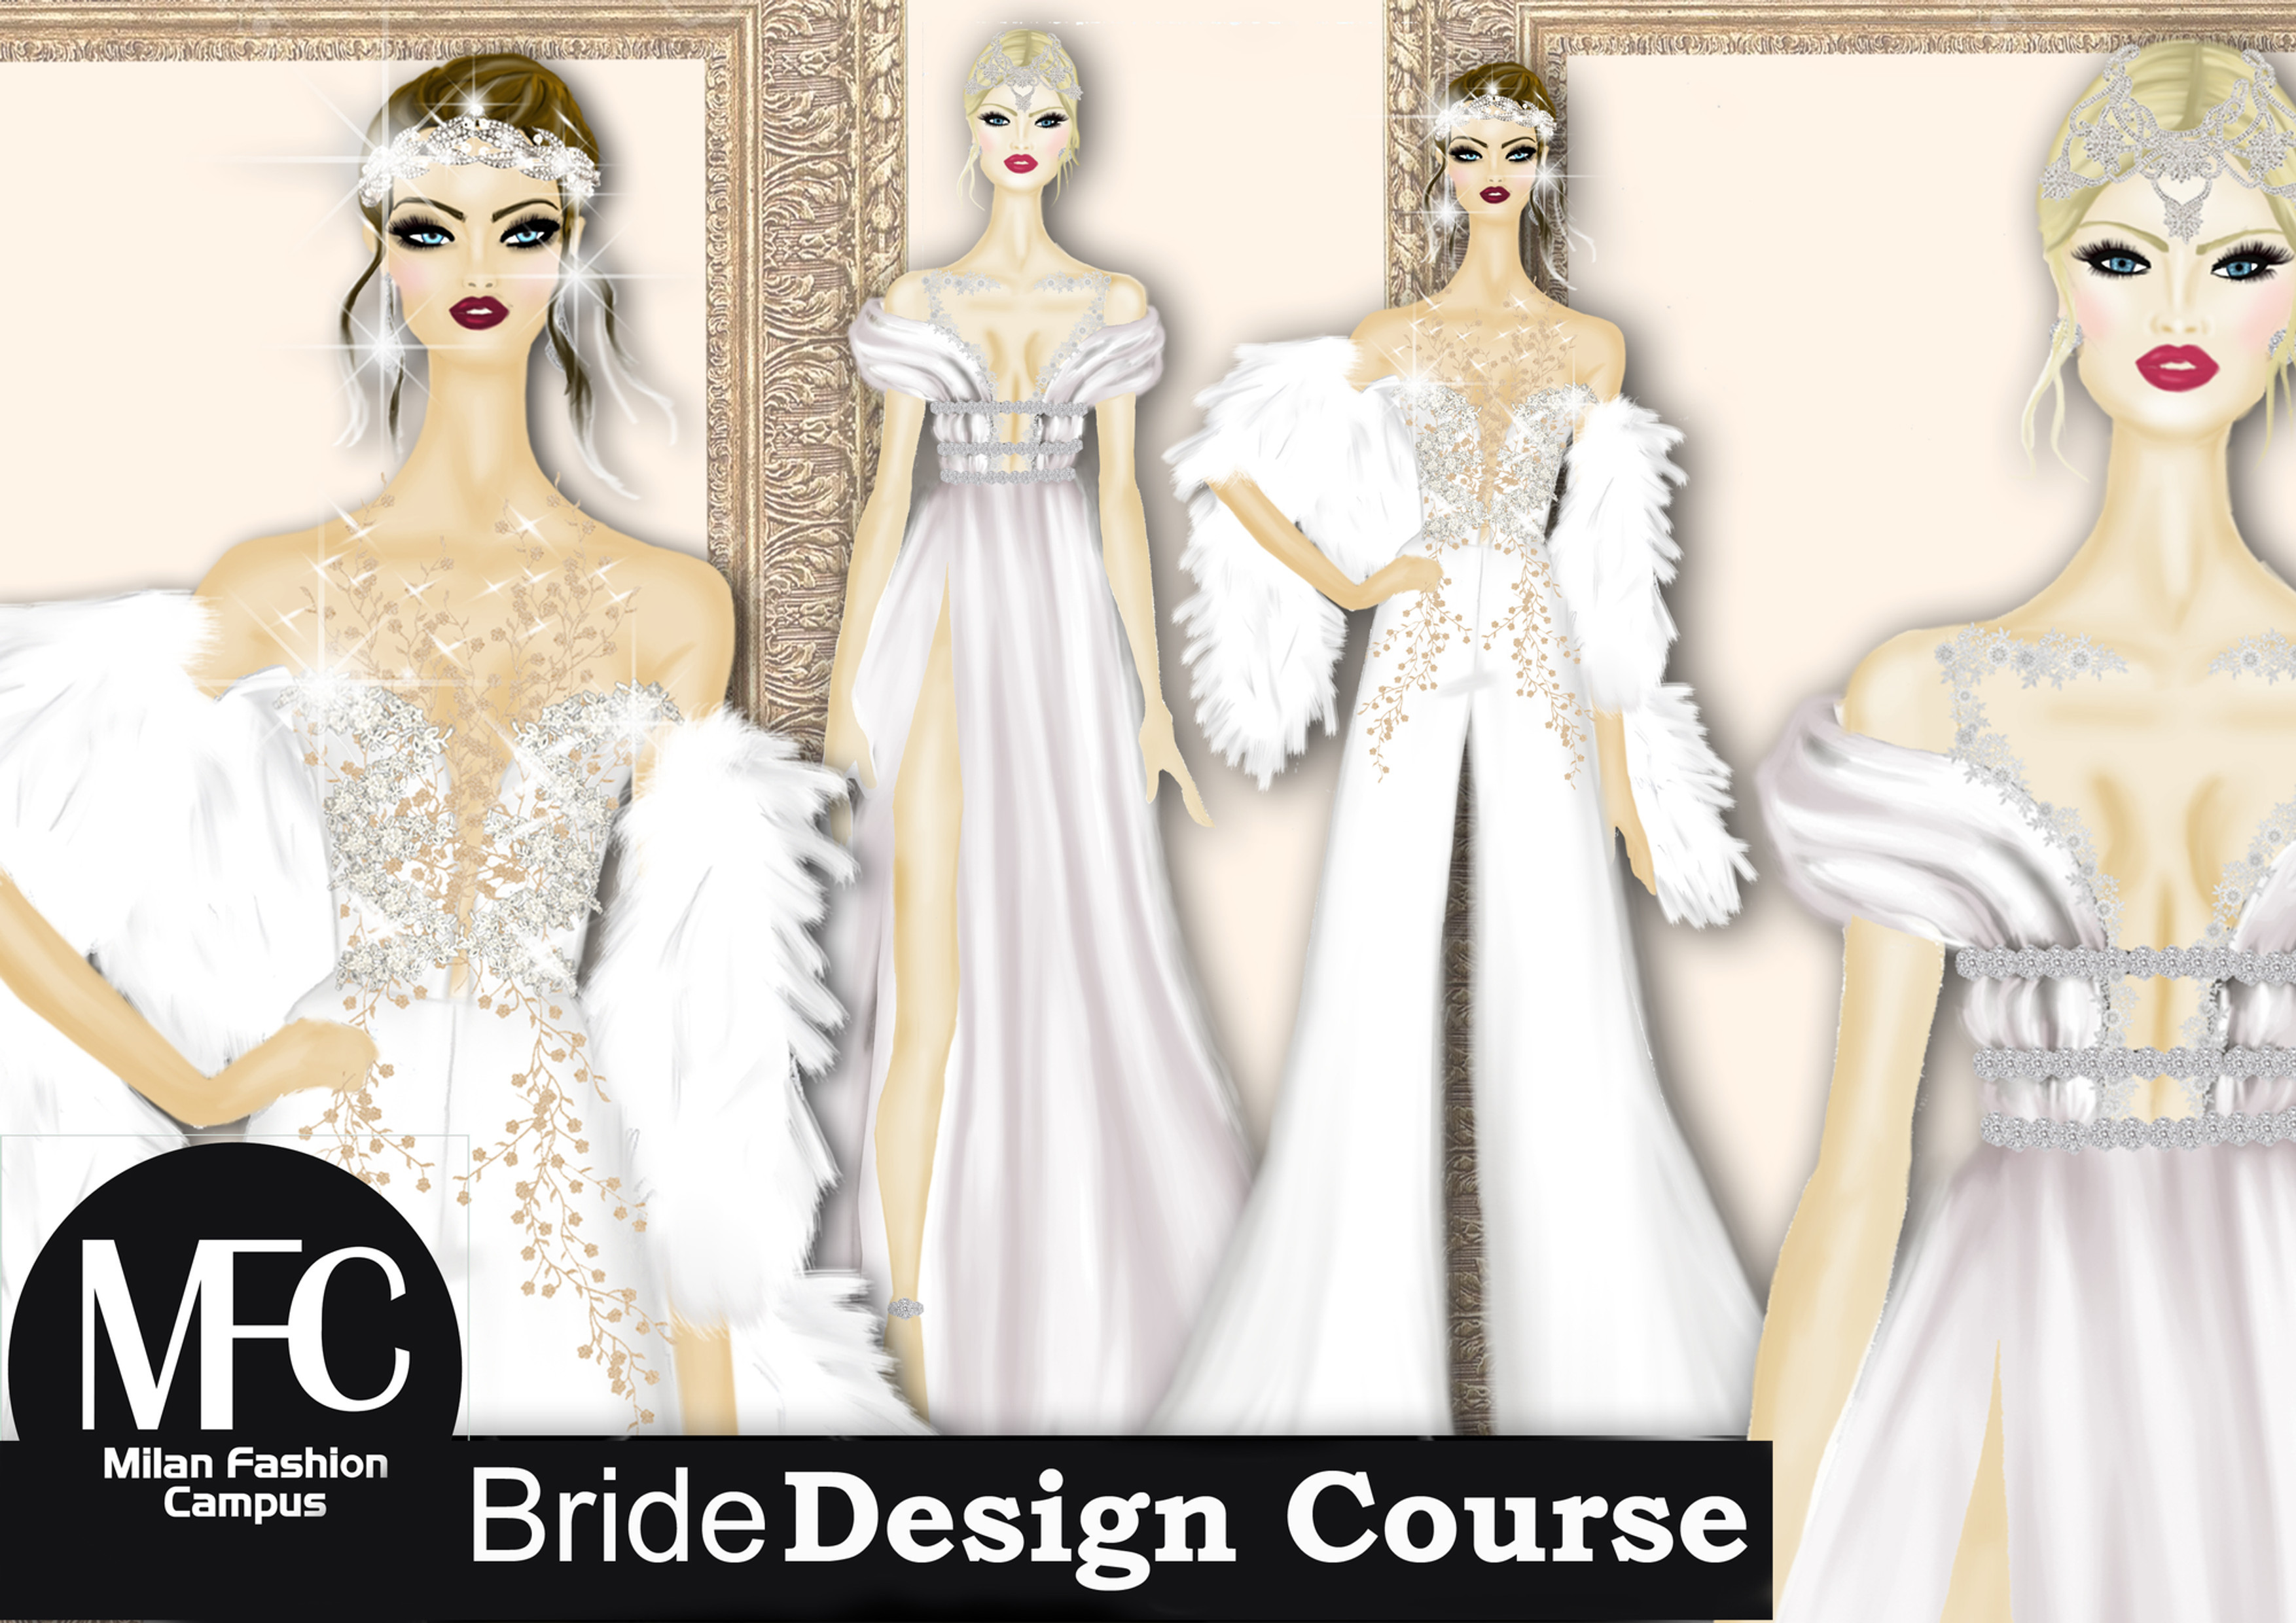 Bridal Wedding Design Course I Italy Milan I Milan Fashion Campus